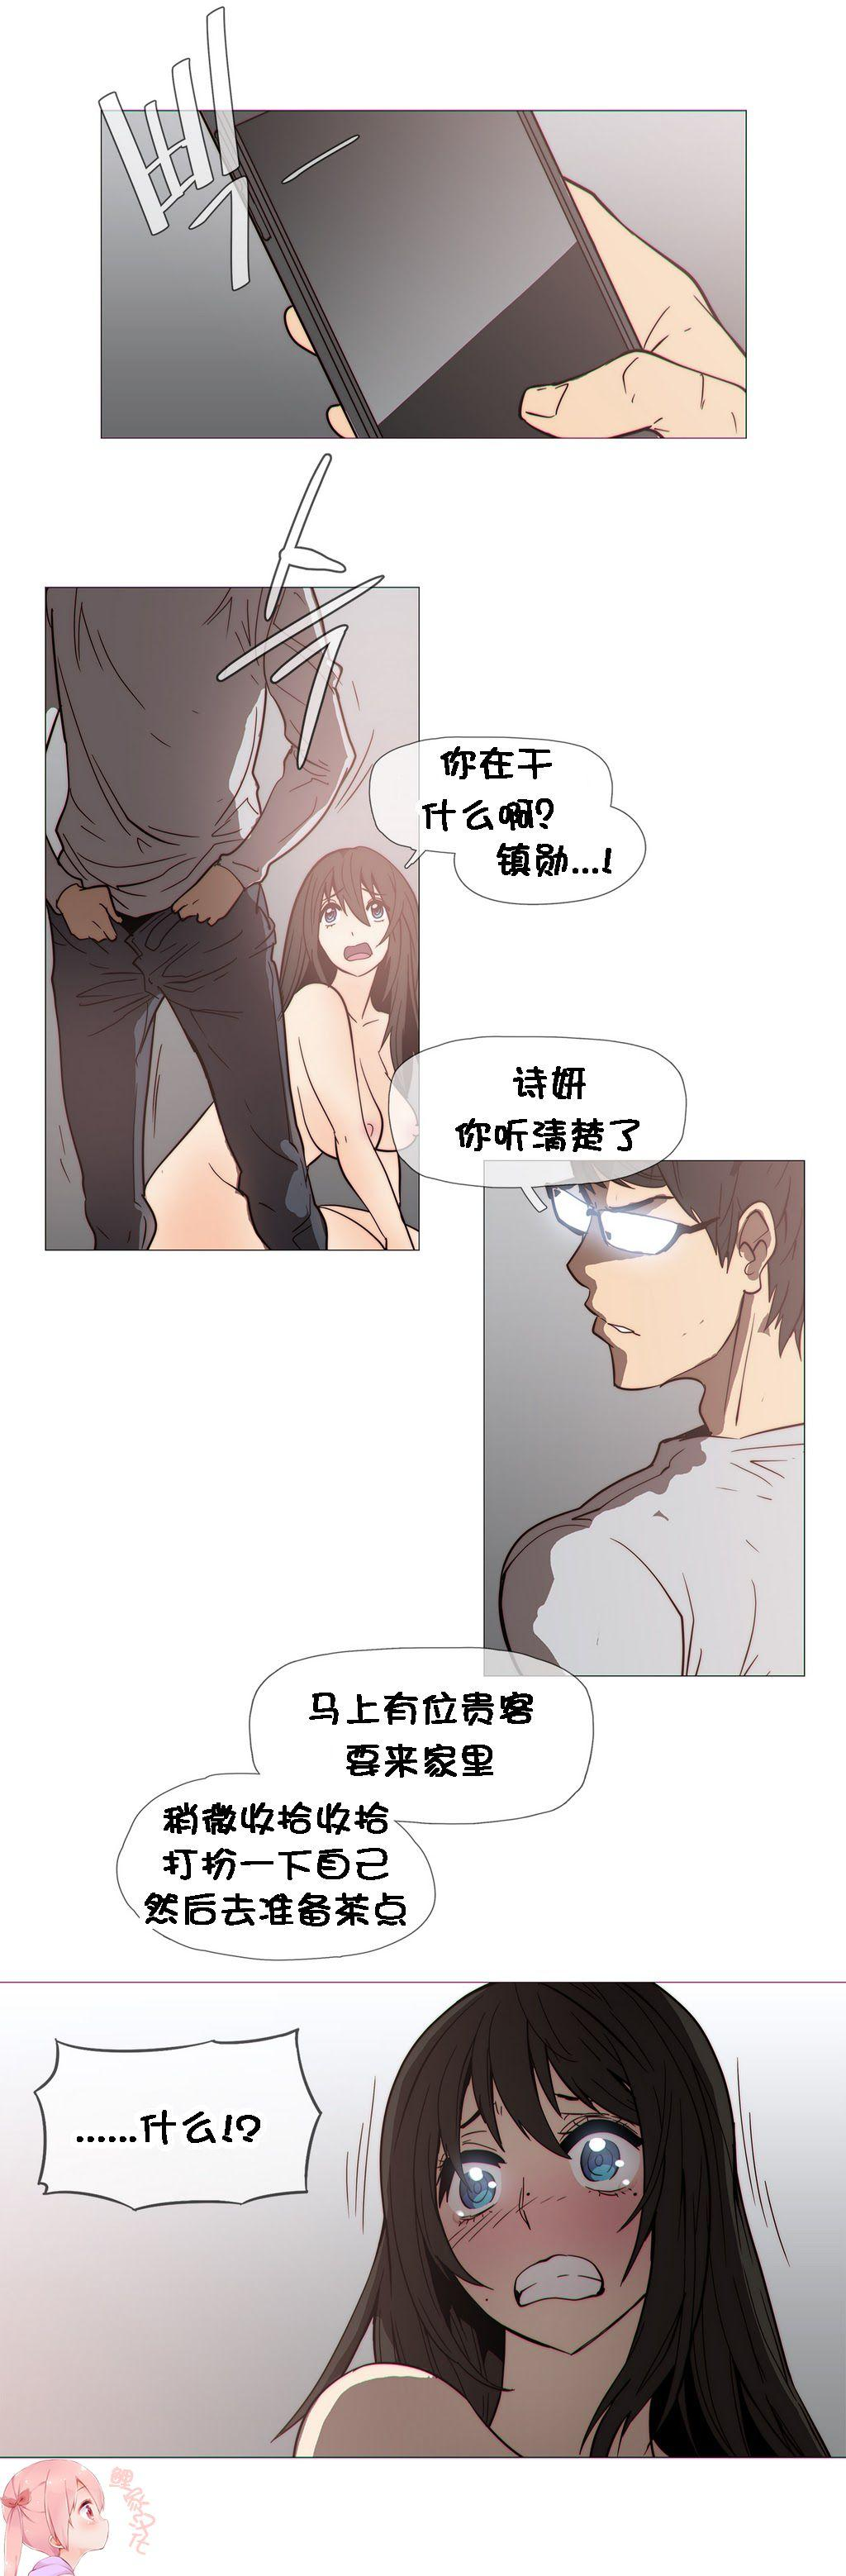 HouseHold Affairs 【卞赤鲤个人汉化】1~33话(持续更新中) 631